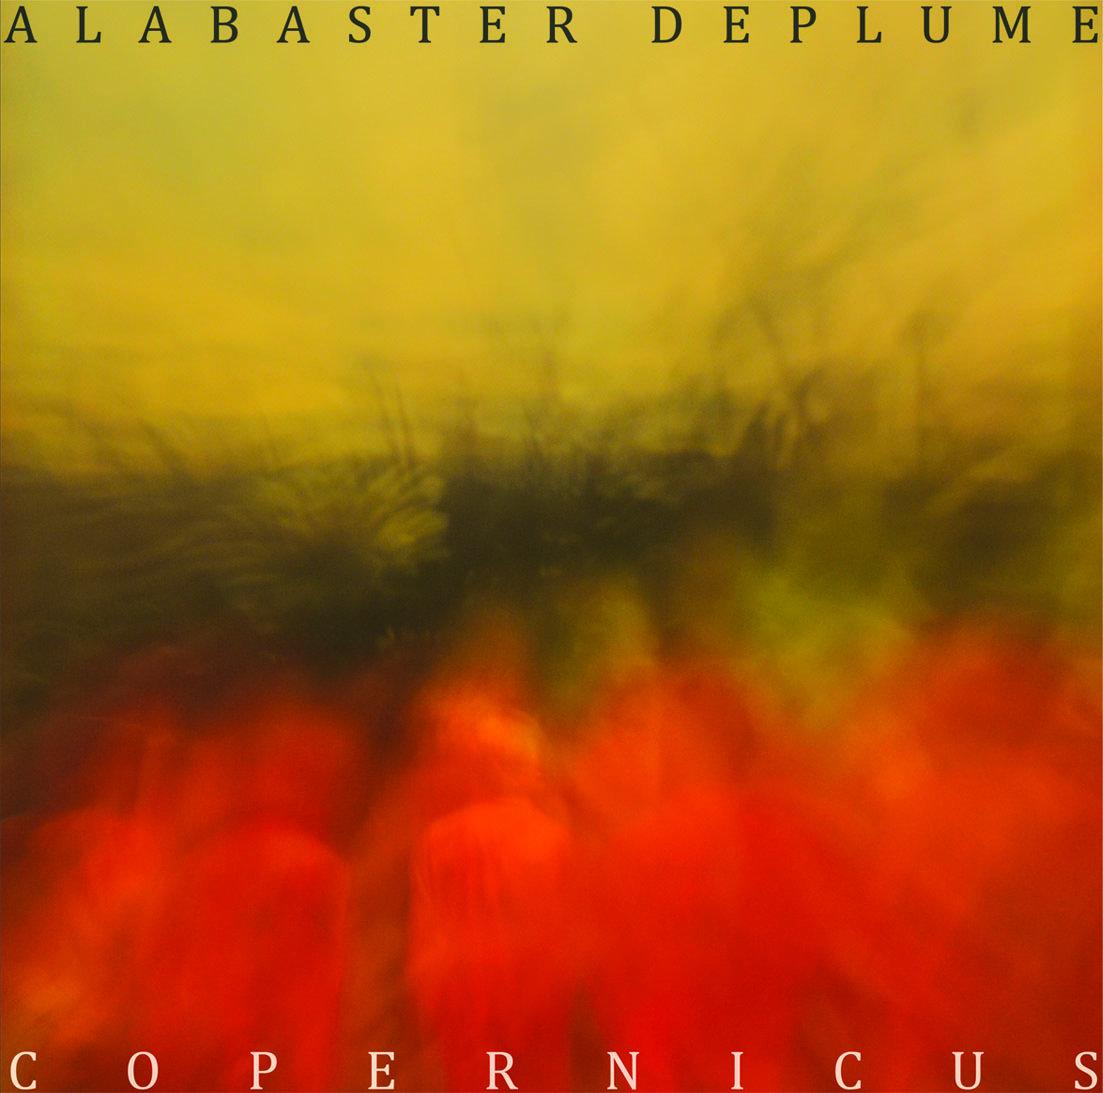 ALABASTER DEPLUME - COPERNICUS (DEBT RECORDS, 2012)